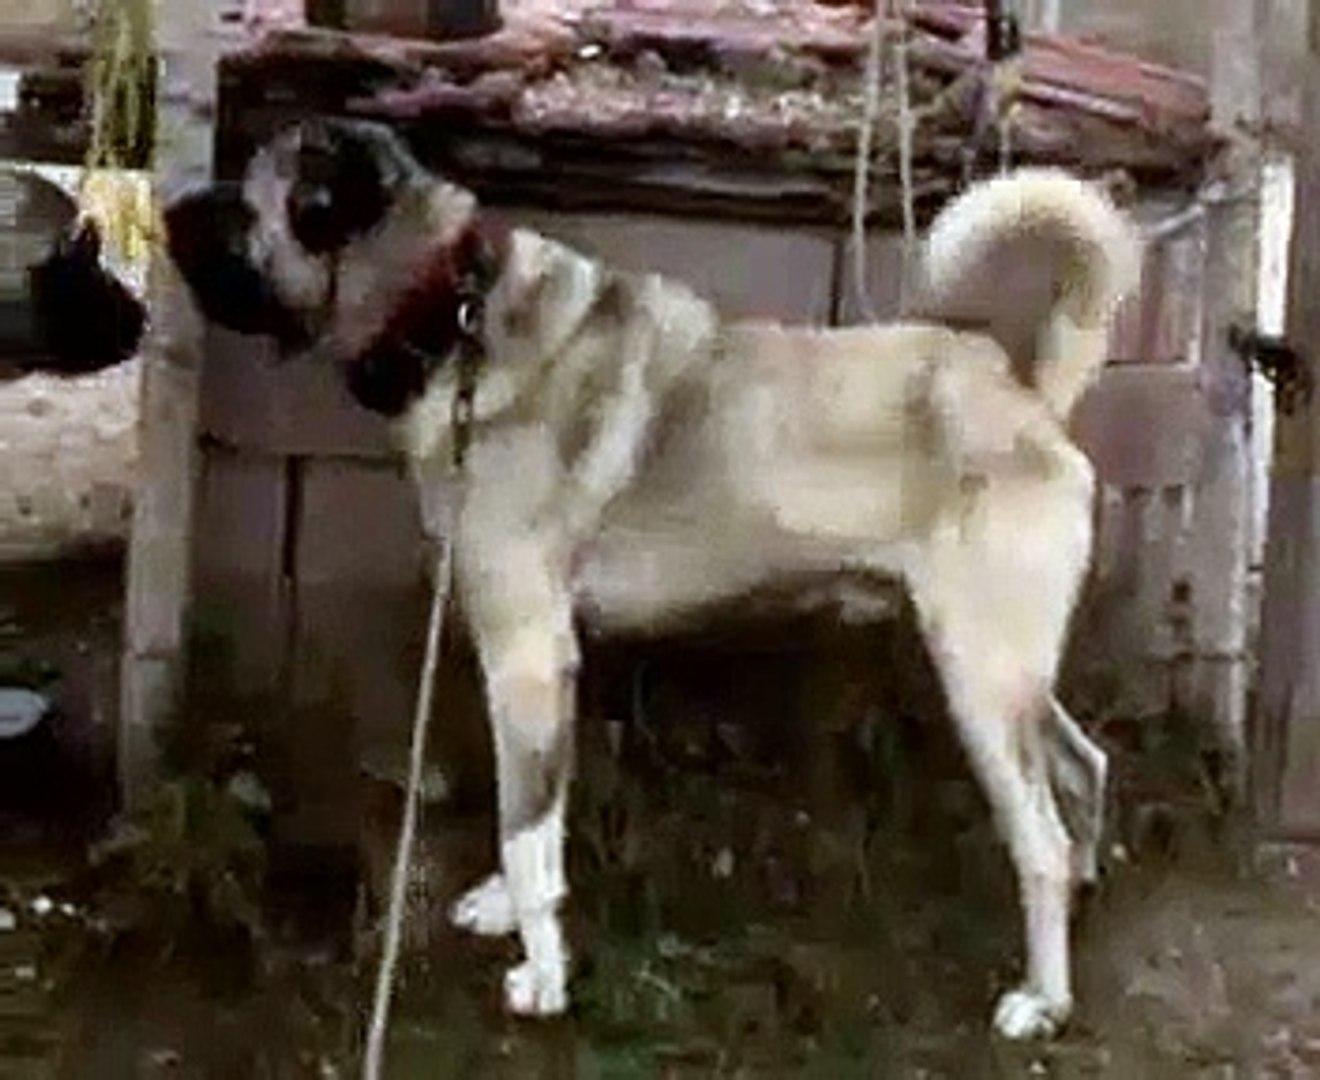 KOCA KOCA DEVLER KUCUK ATISMA - GiANT ANATOLiAN SHEPHERD DOGS VS